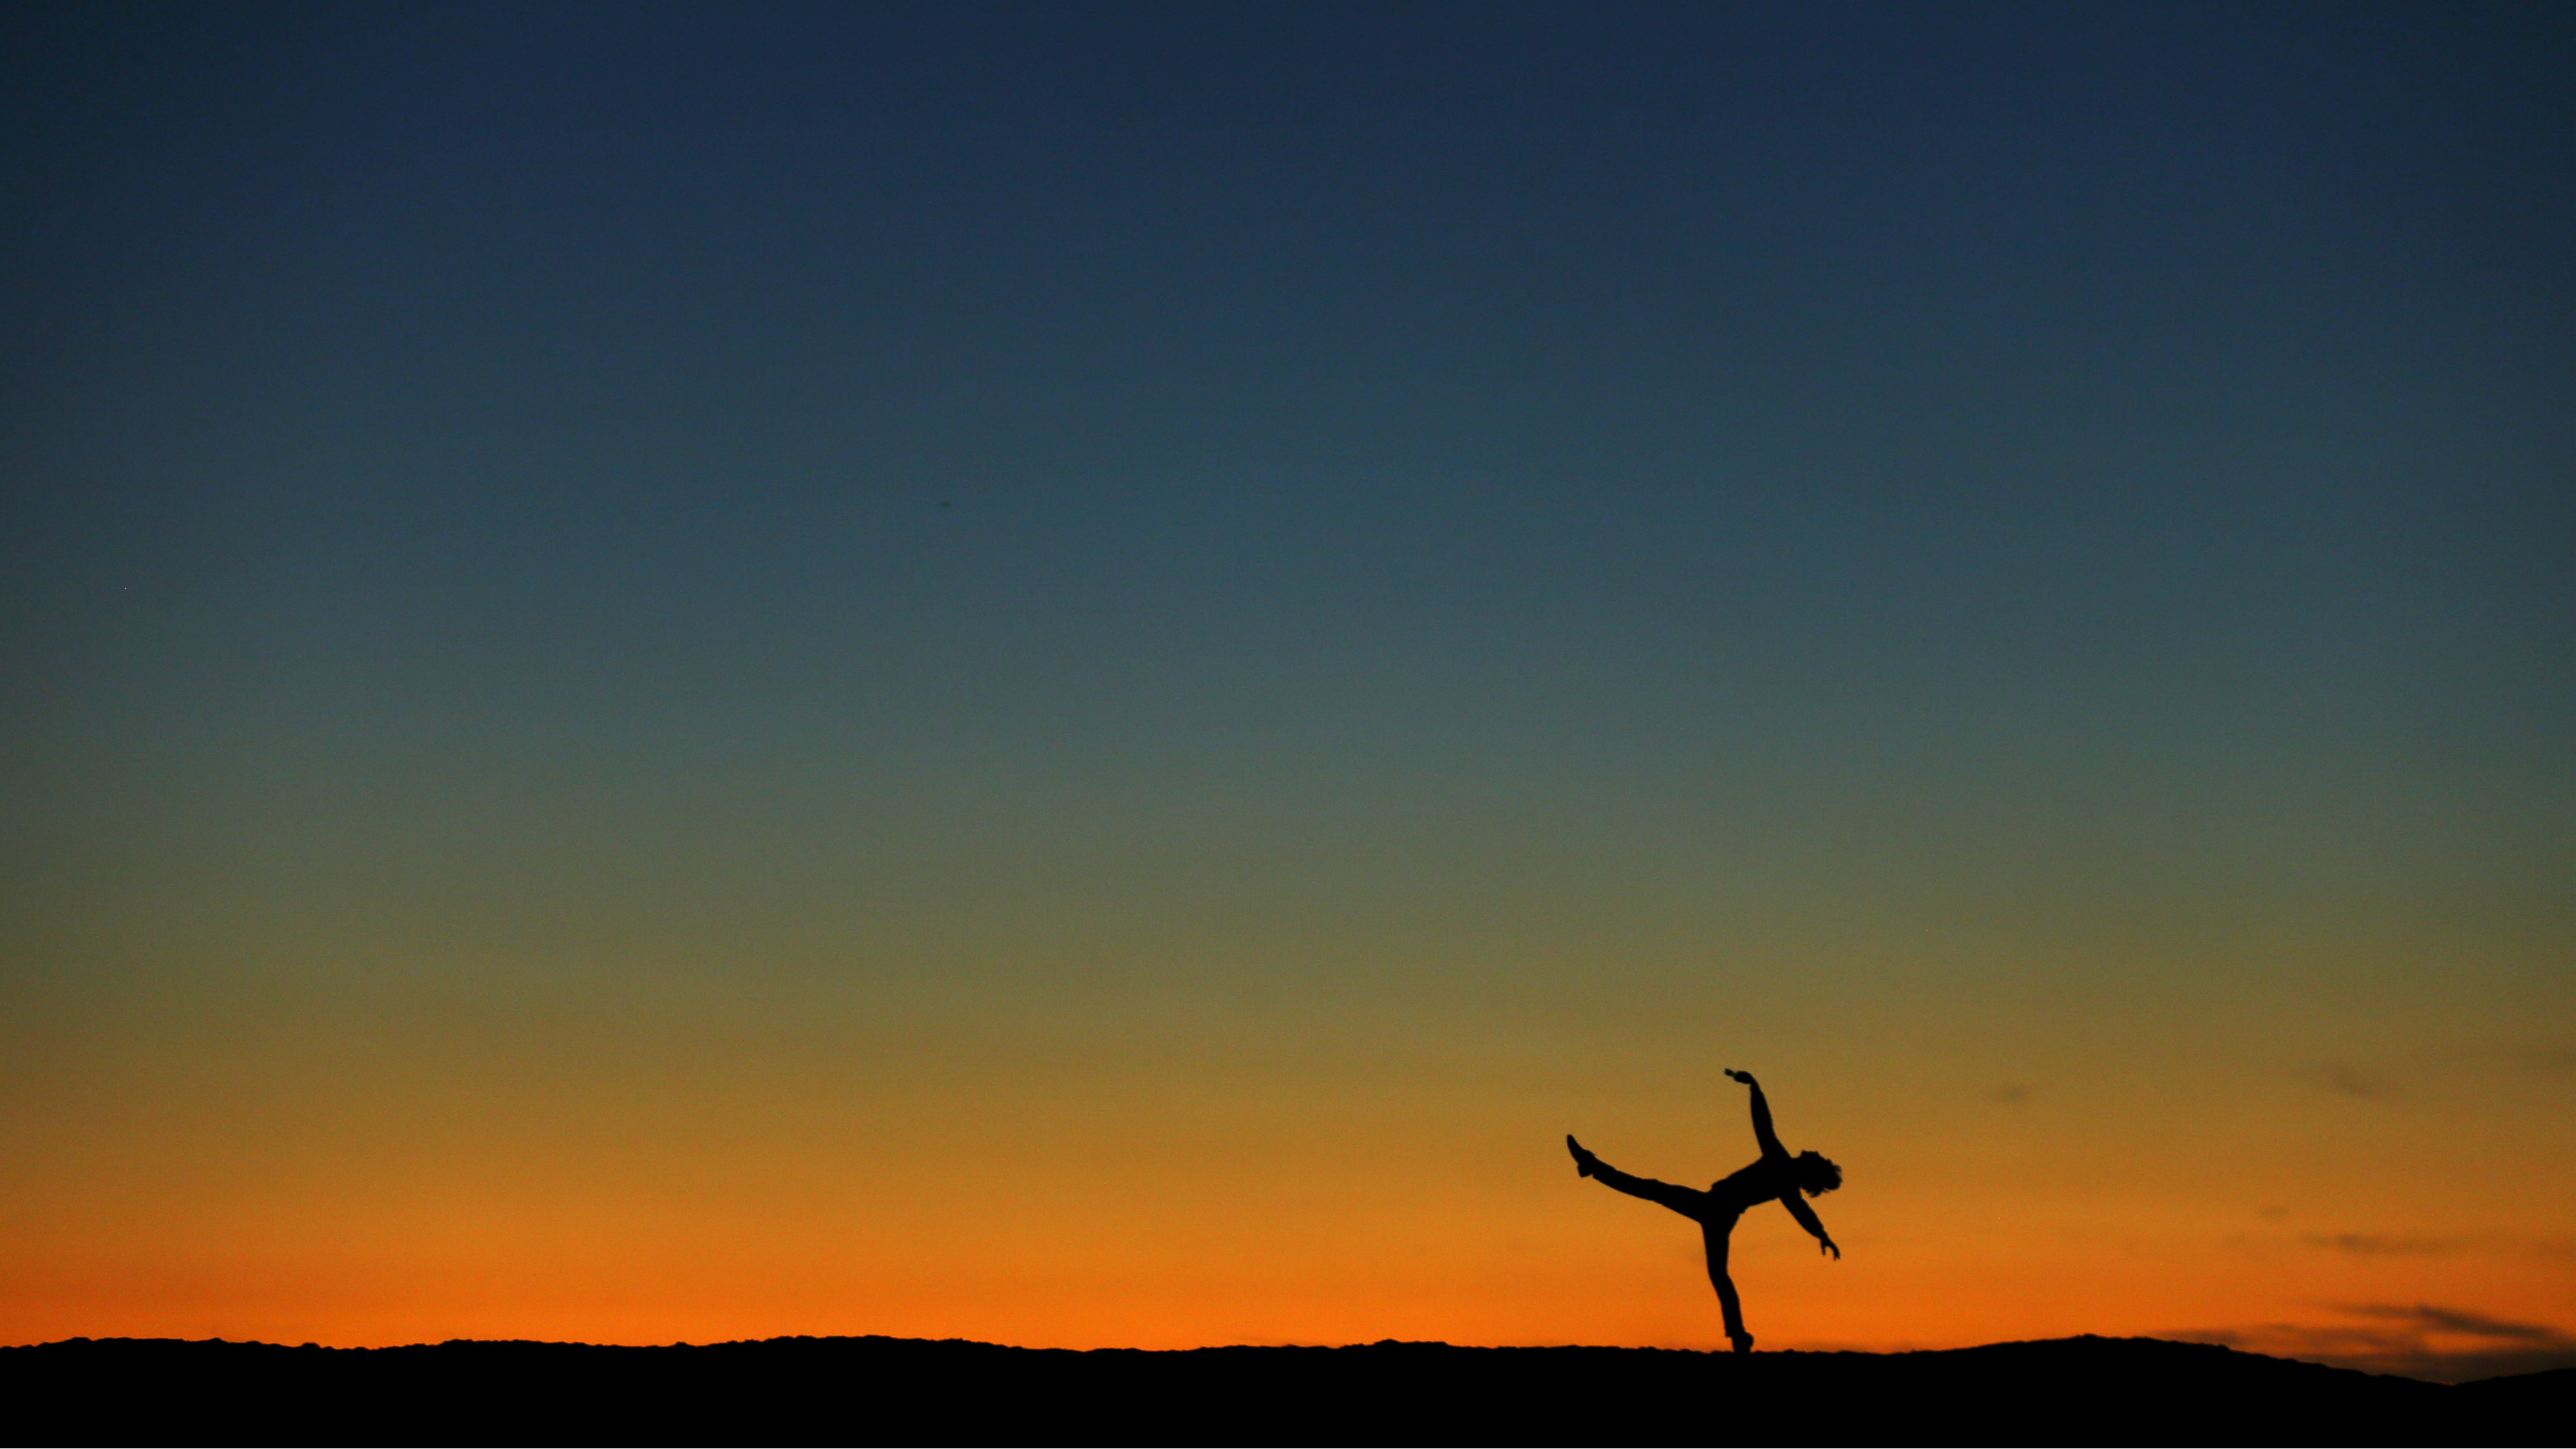 :Former ballerina Luke Willis plays on a sand berm after sunset in Encinitas